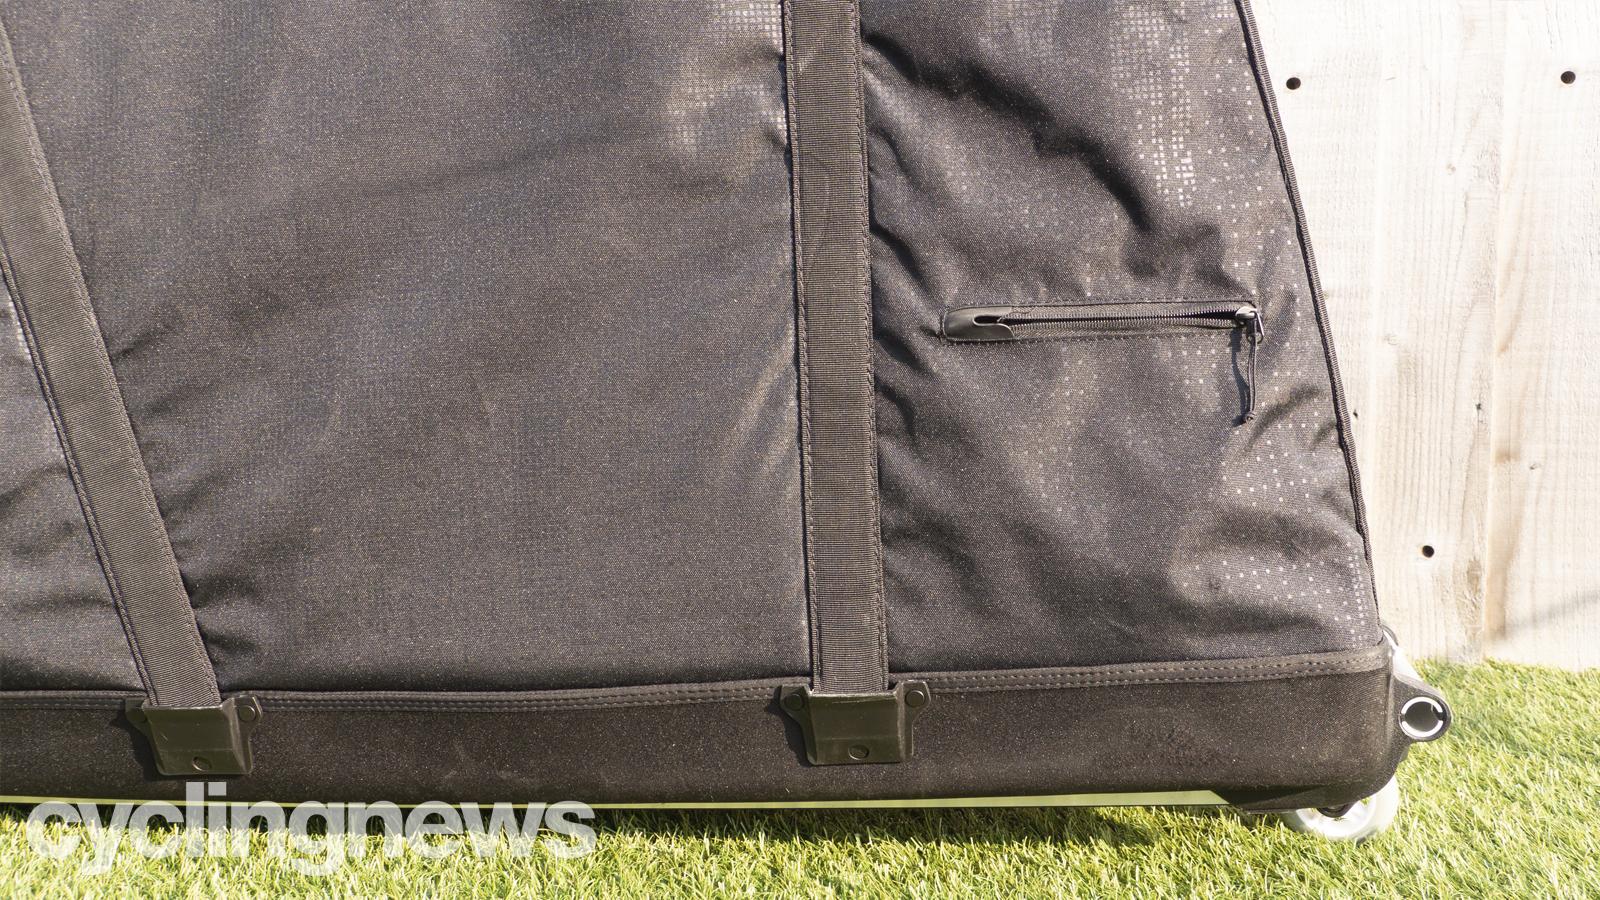 EVOC Road Bike Bag Pro review